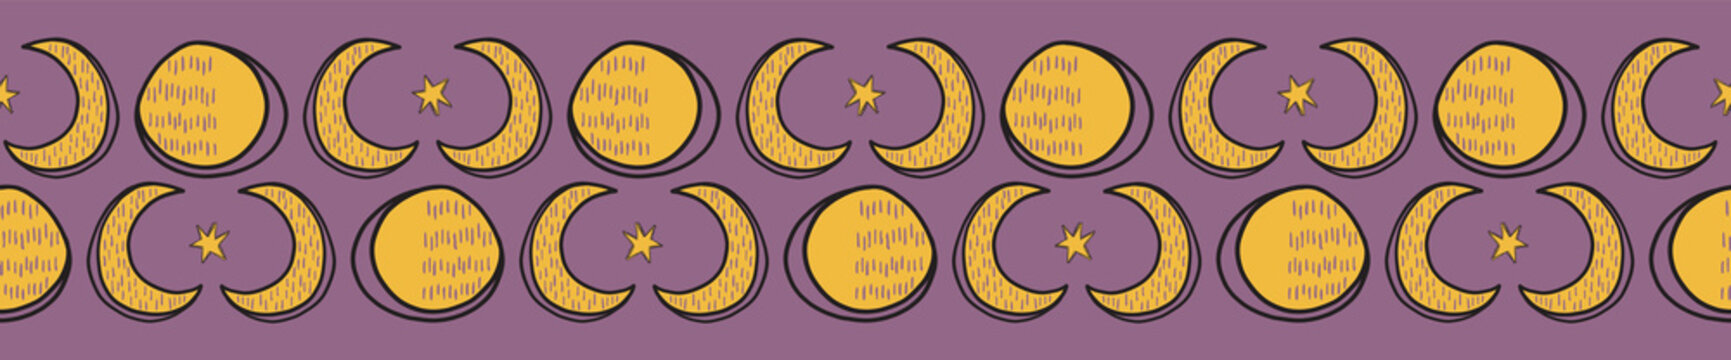 Sacred Lunar Moon Solstice Seamless Vector Border. Esoteric Spiritual Symbols Concept Illustration. Spiritual Astrology Meditation Background, For Boho Ritual Witchy Banner Backdrop. Yellow Purple